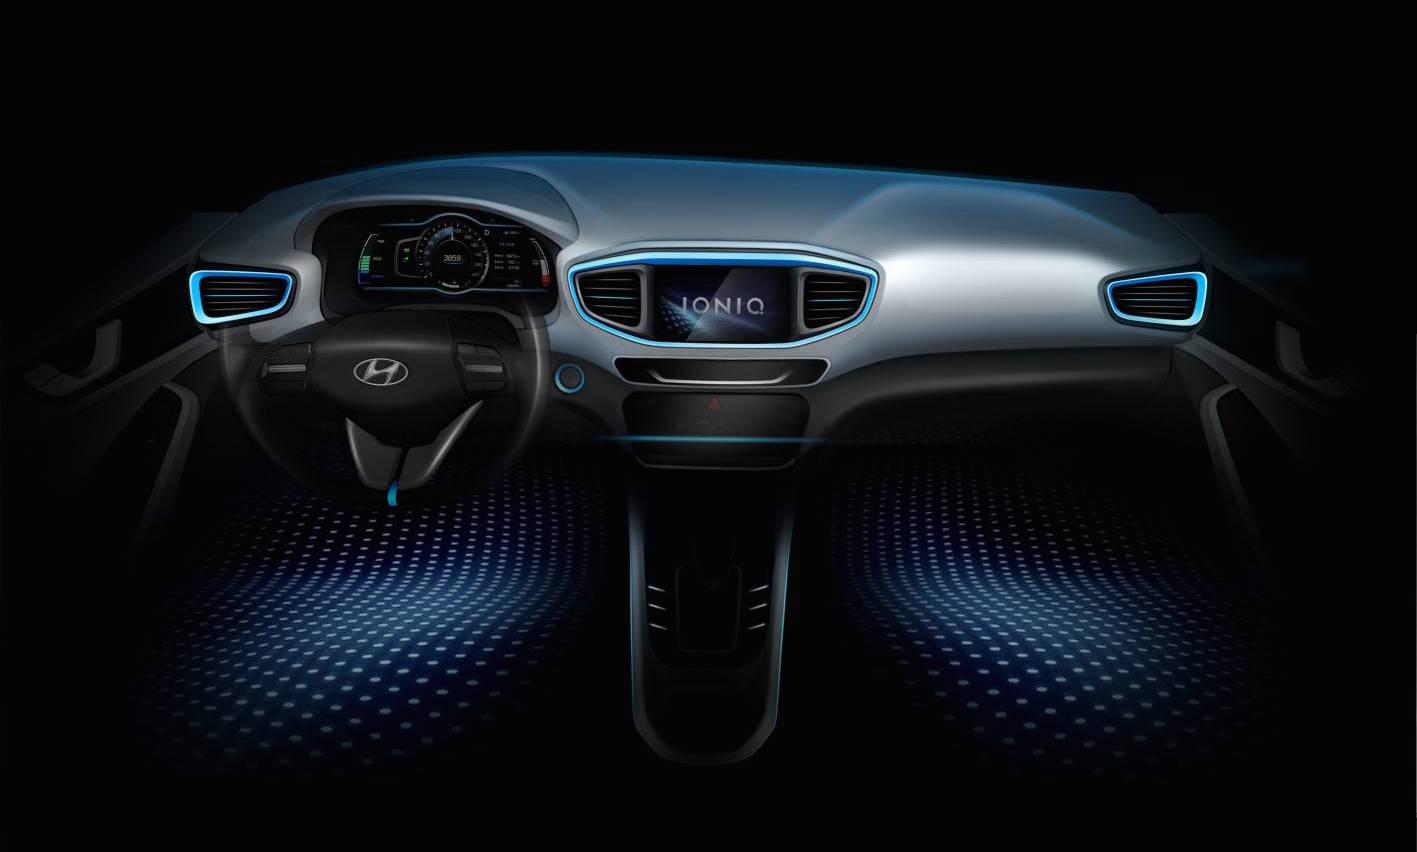 ioniq hyundai 39 s new hybrid ev previewed again interior shown performancedrive. Black Bedroom Furniture Sets. Home Design Ideas